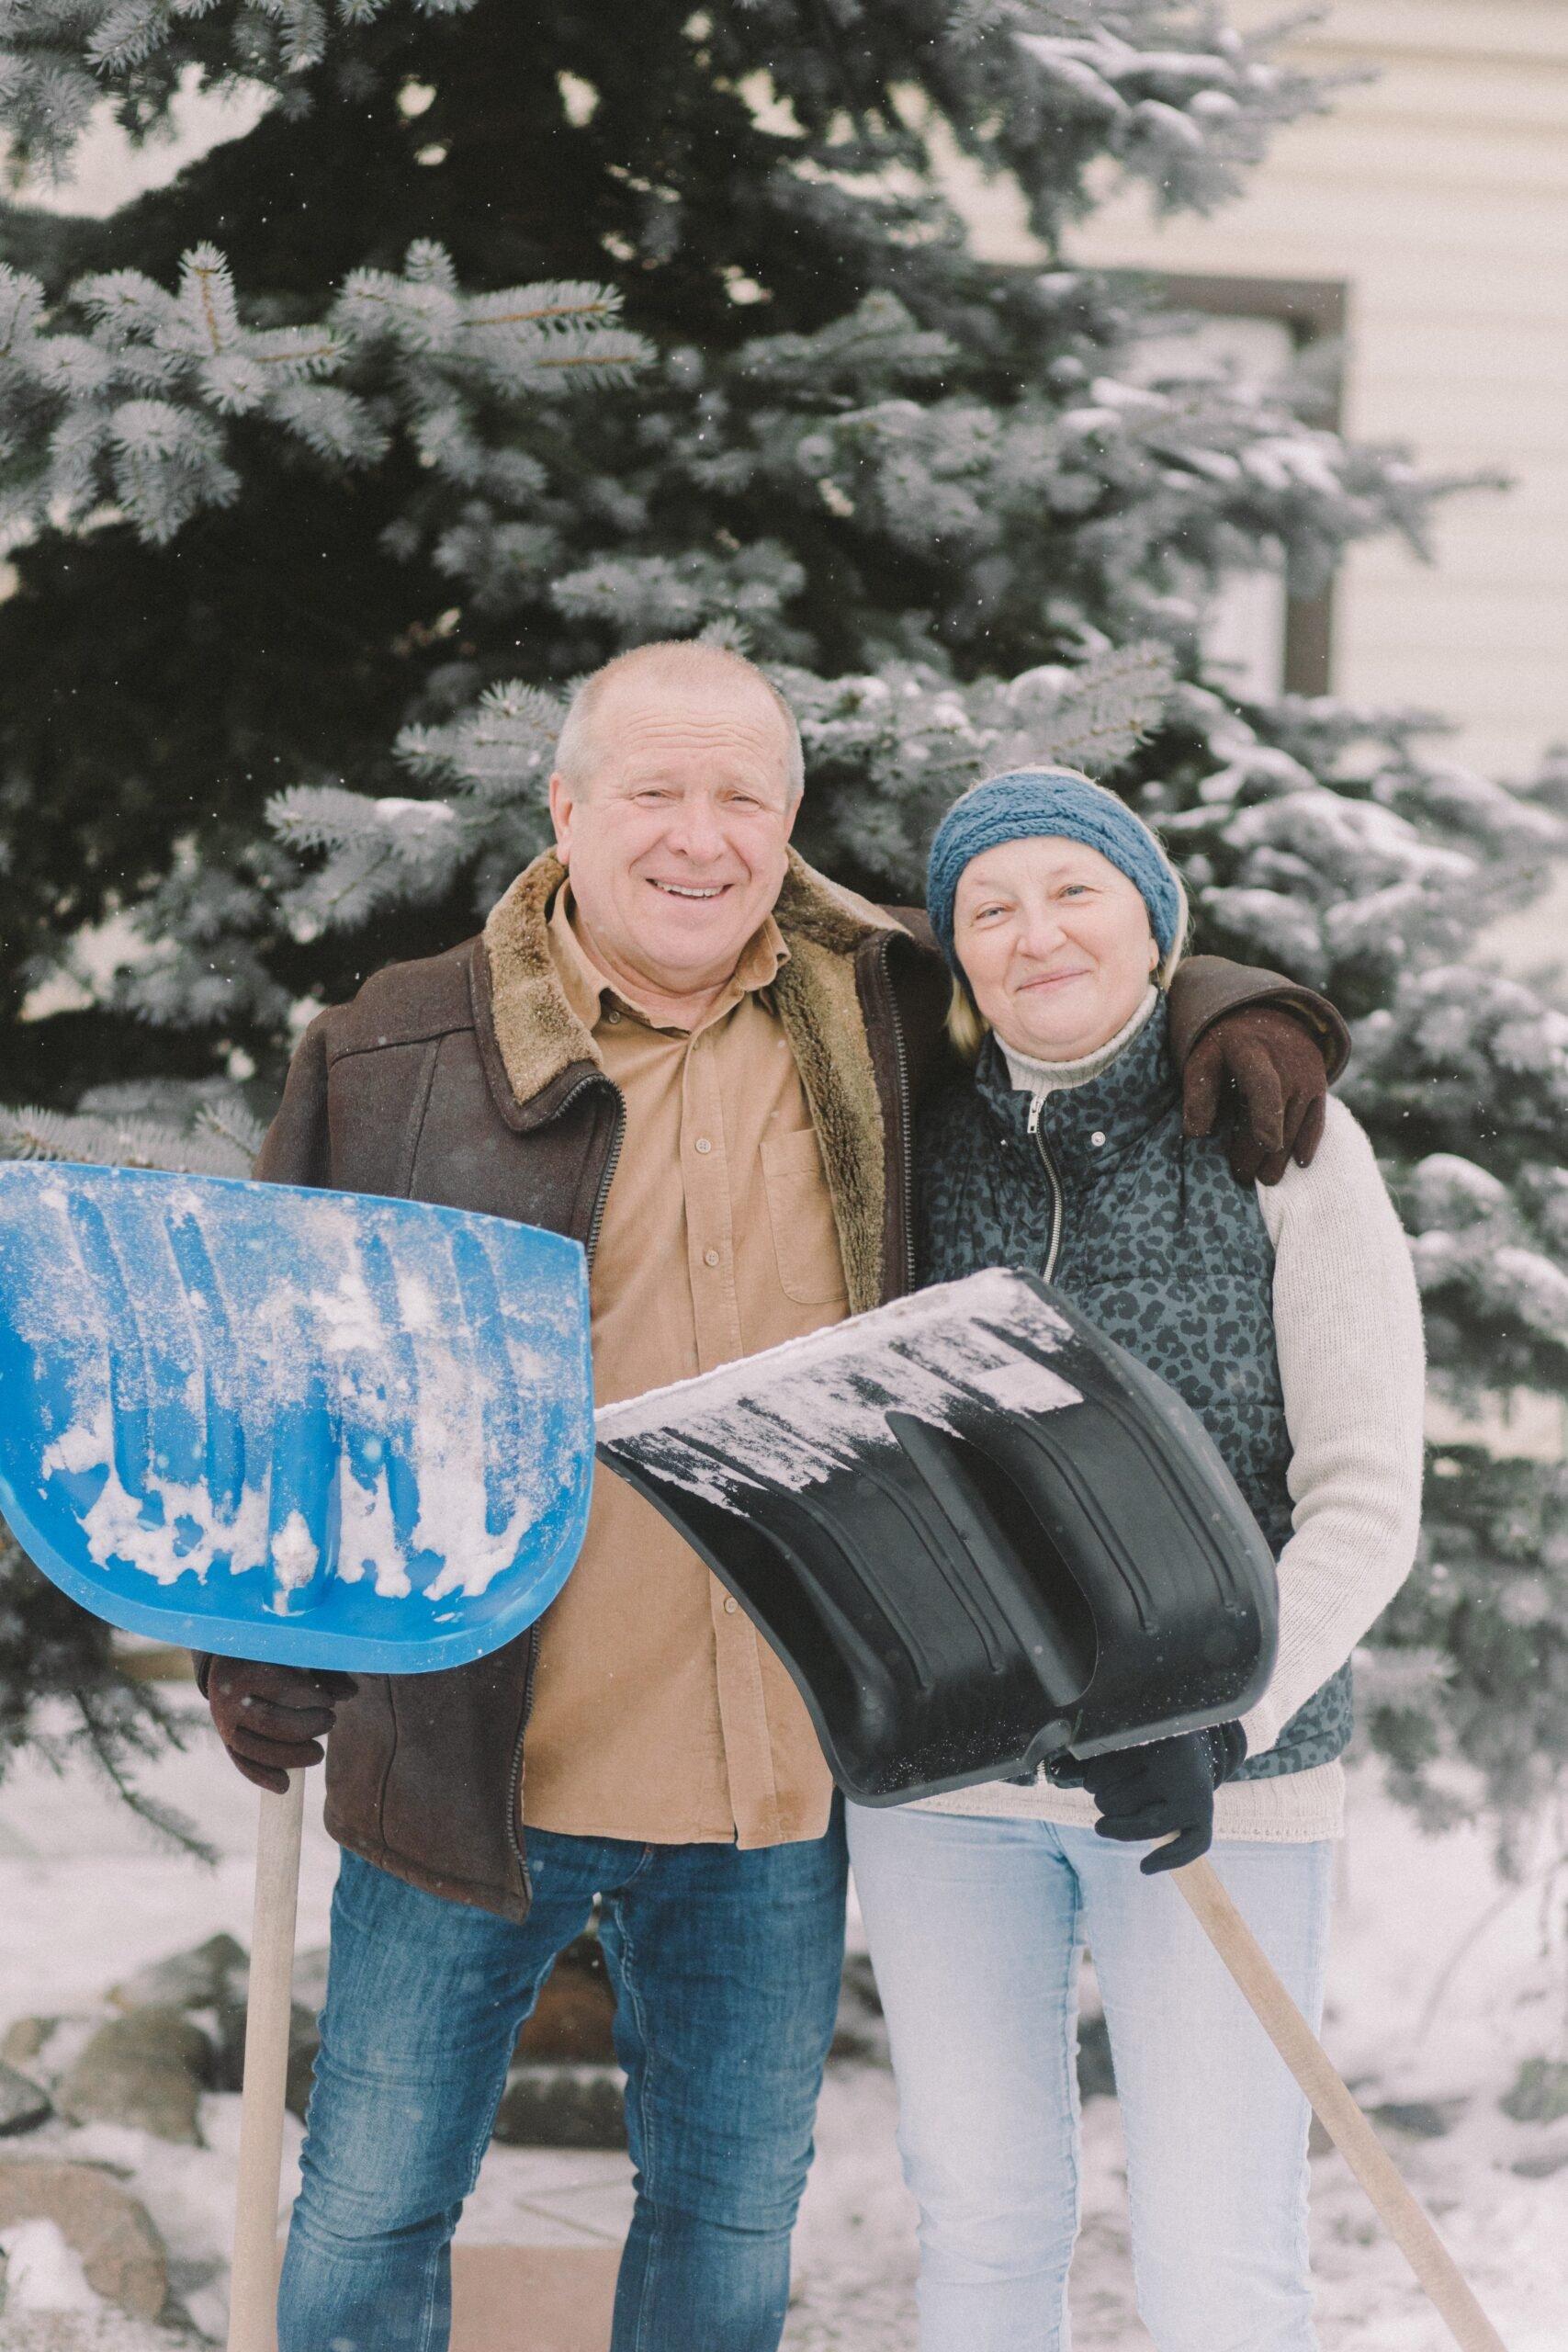 senior couple shovelling snow outside their home